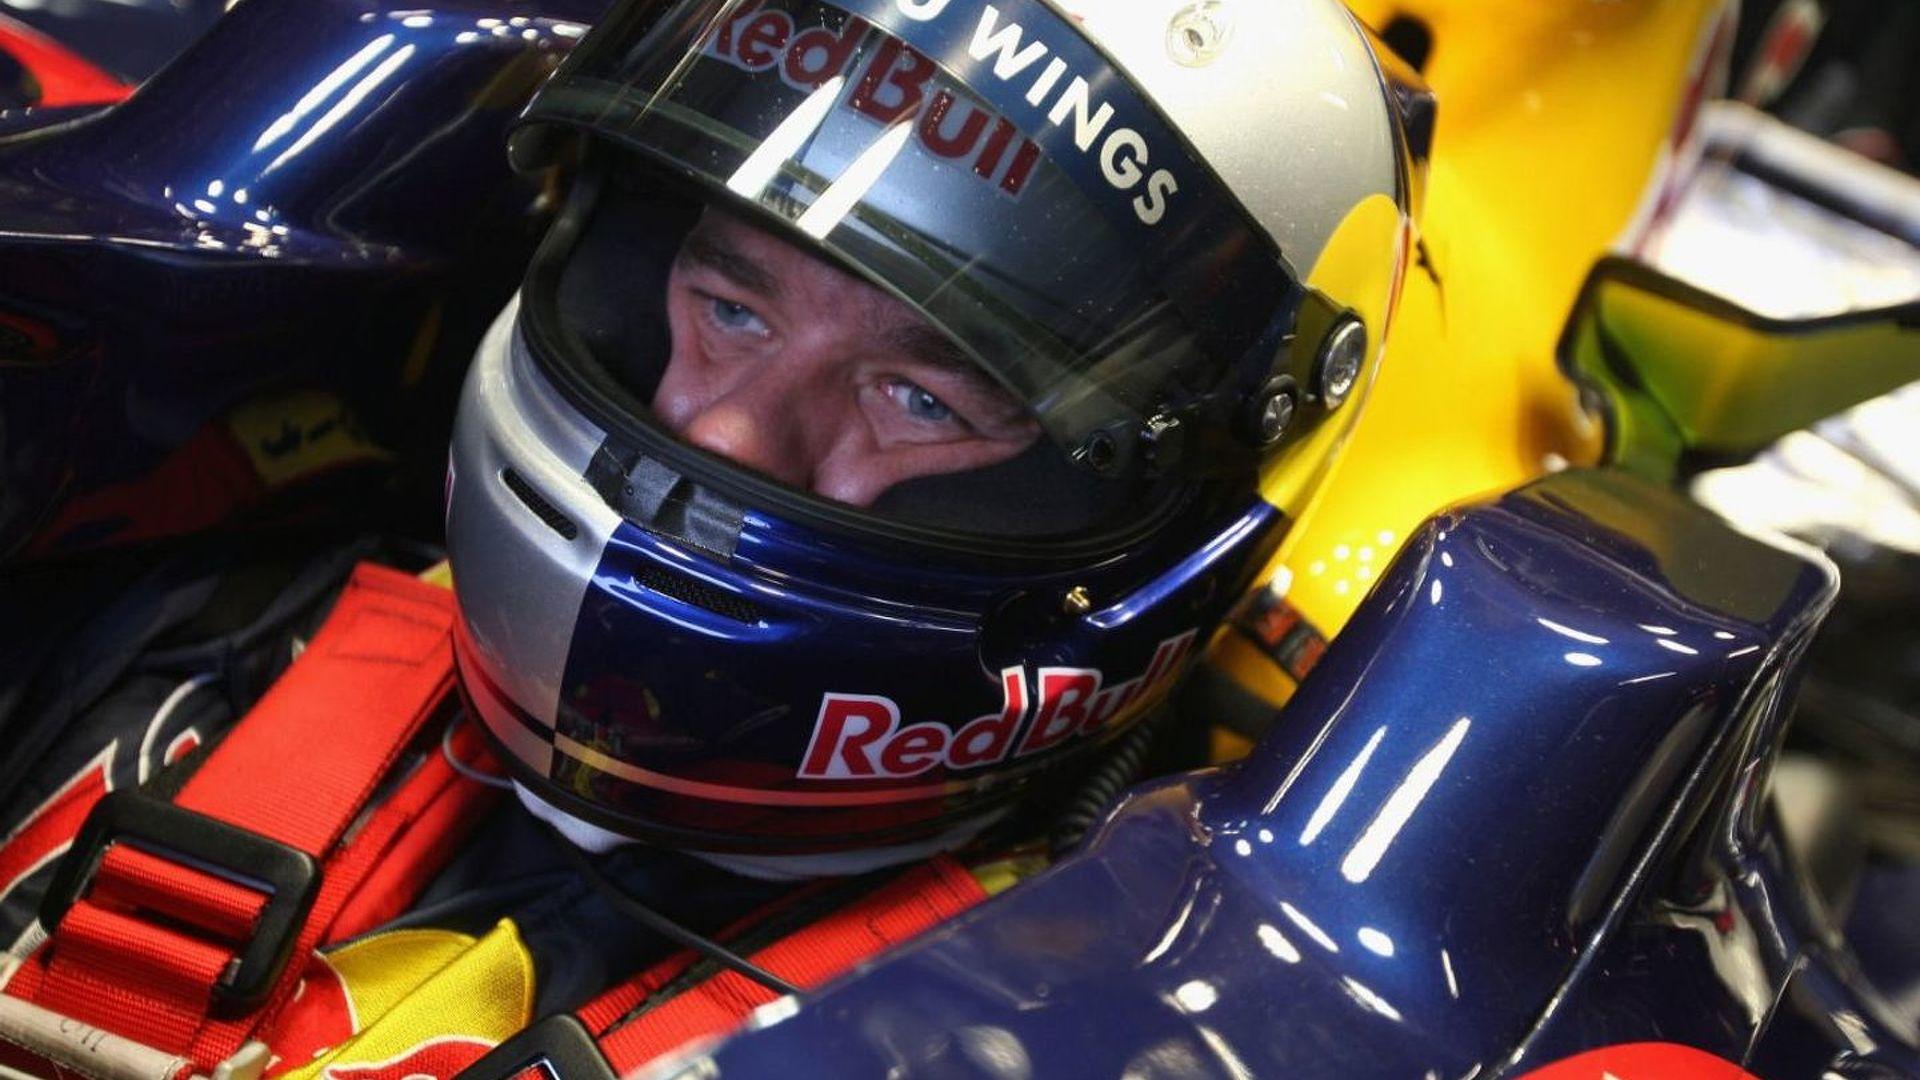 Loeb plays down new Toro Rosso reports